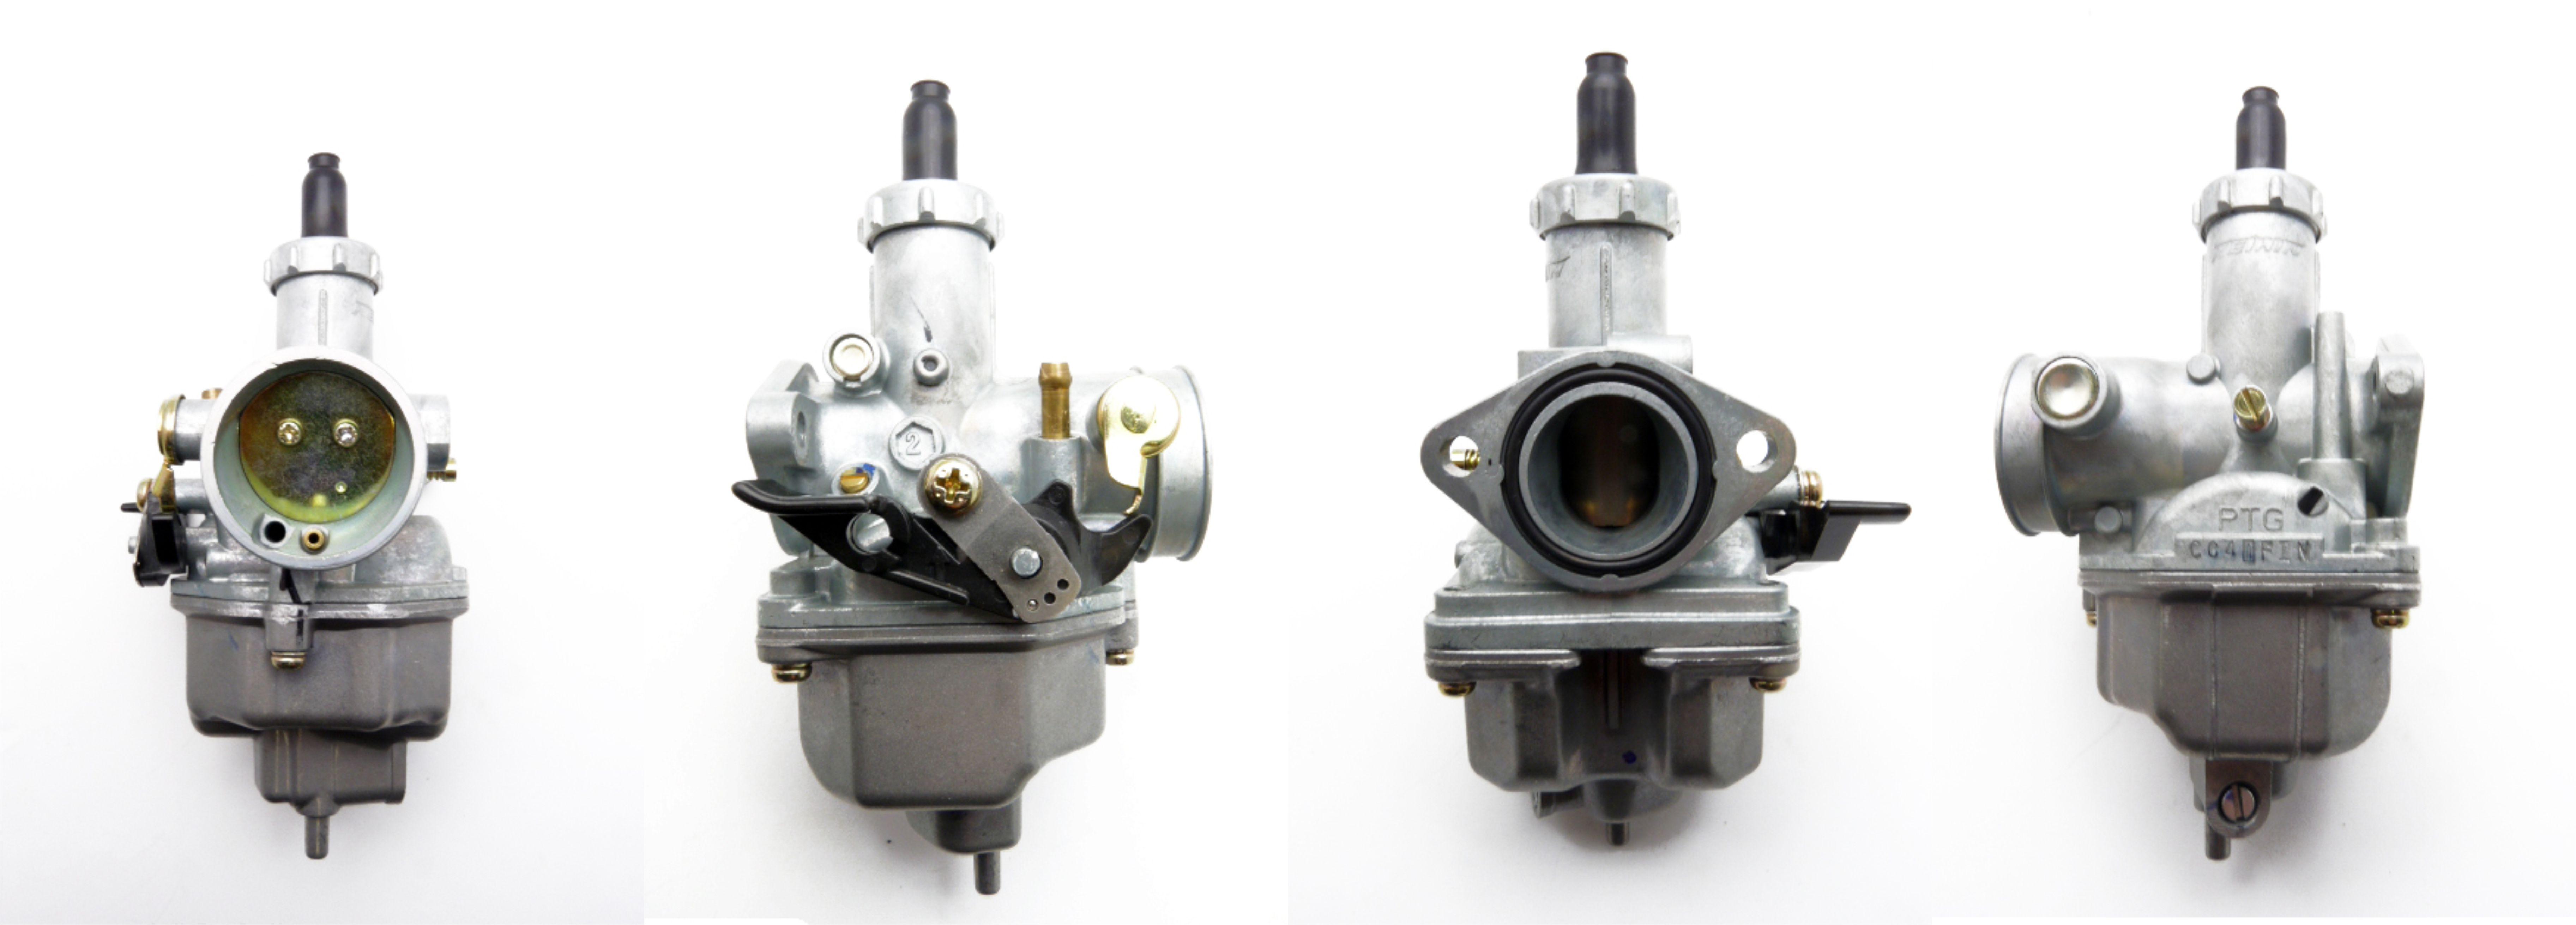 Karburátor Keihin 22 Stomp, DemonX, WPB